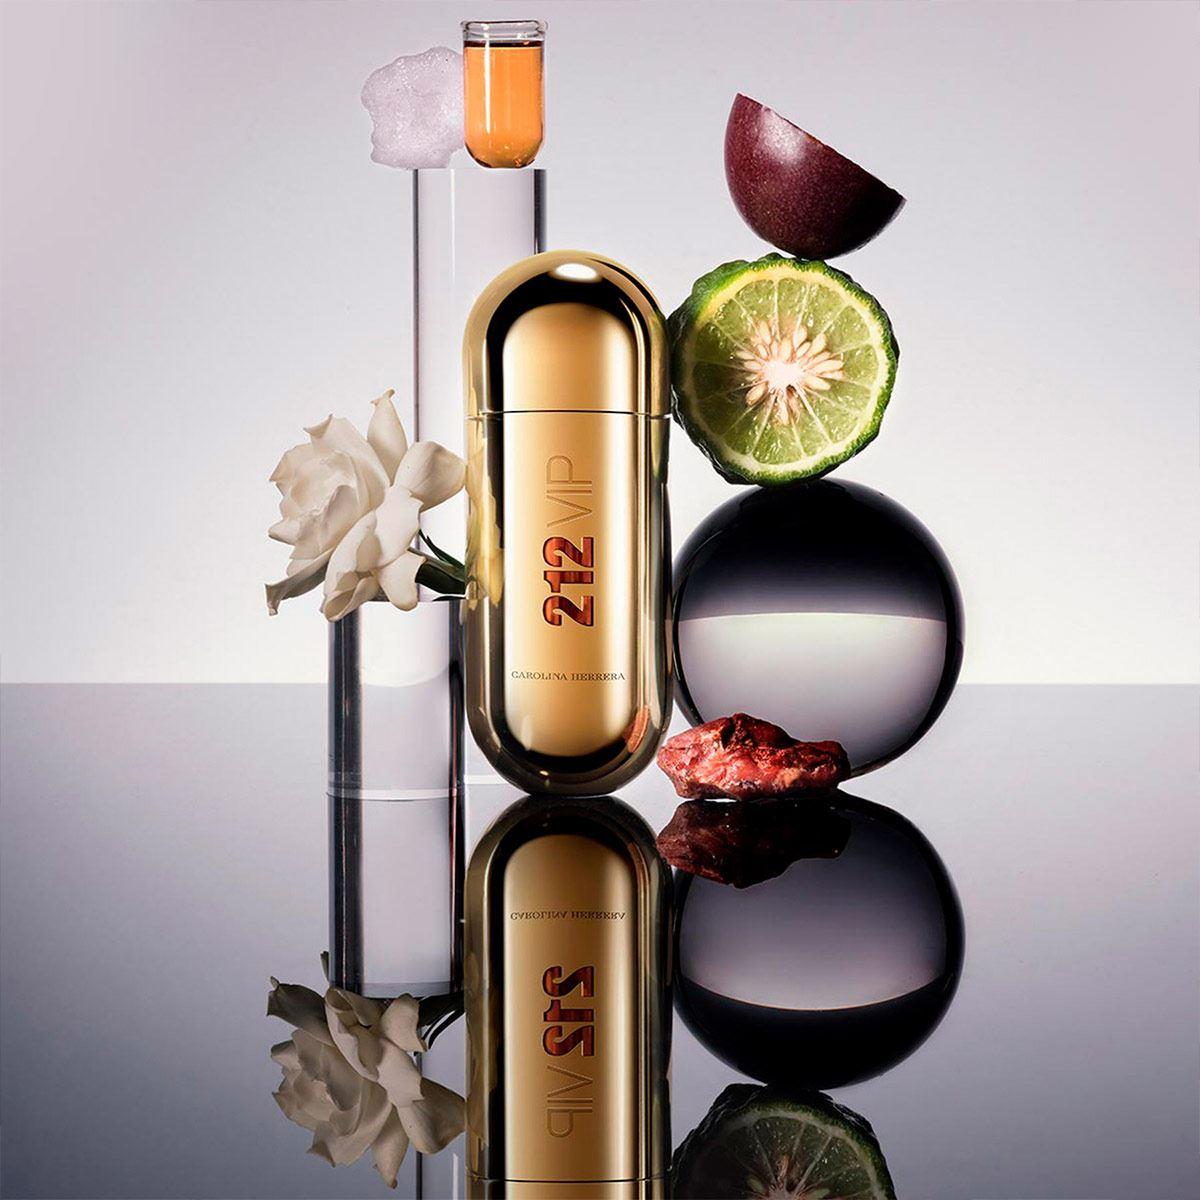 Fragancia Para Dama Set, Carolina Herrera, 212 VIP EDP 80ML + Body lotion 100ML